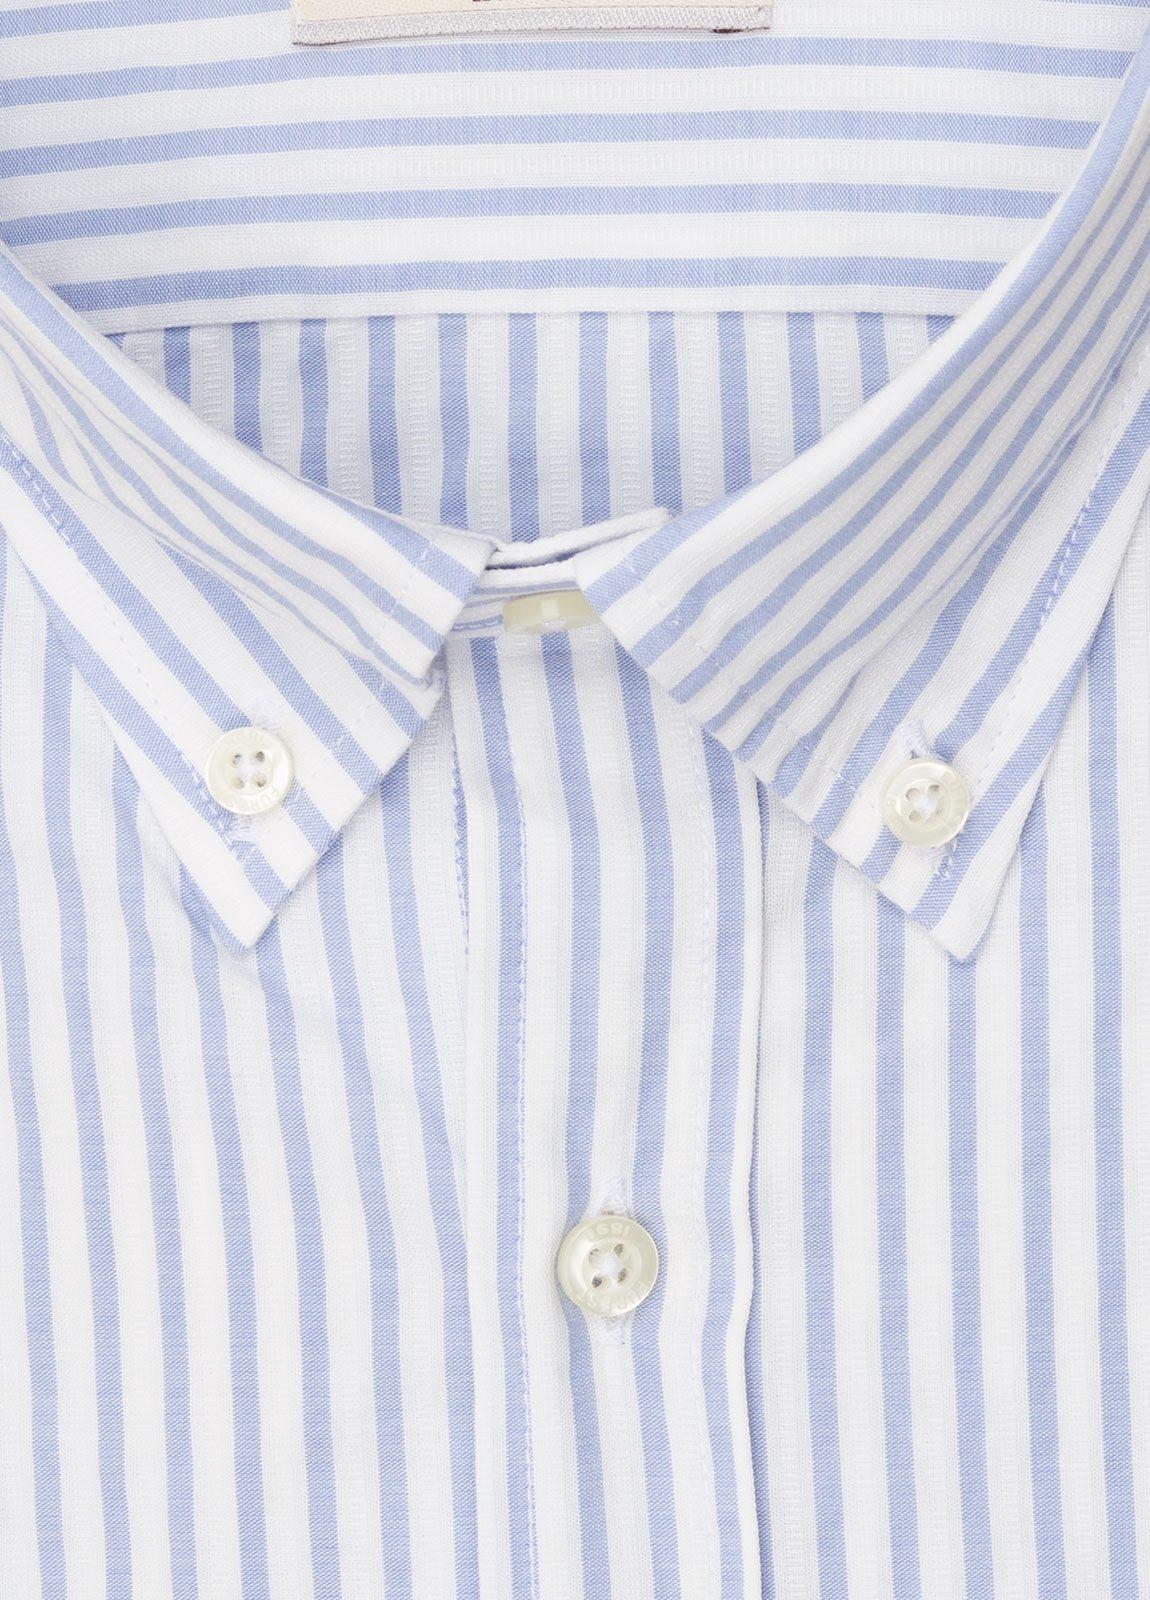 Camisa sport FUREST COLECCIÓN REGULAR FIT rayas celeste - Ítem1